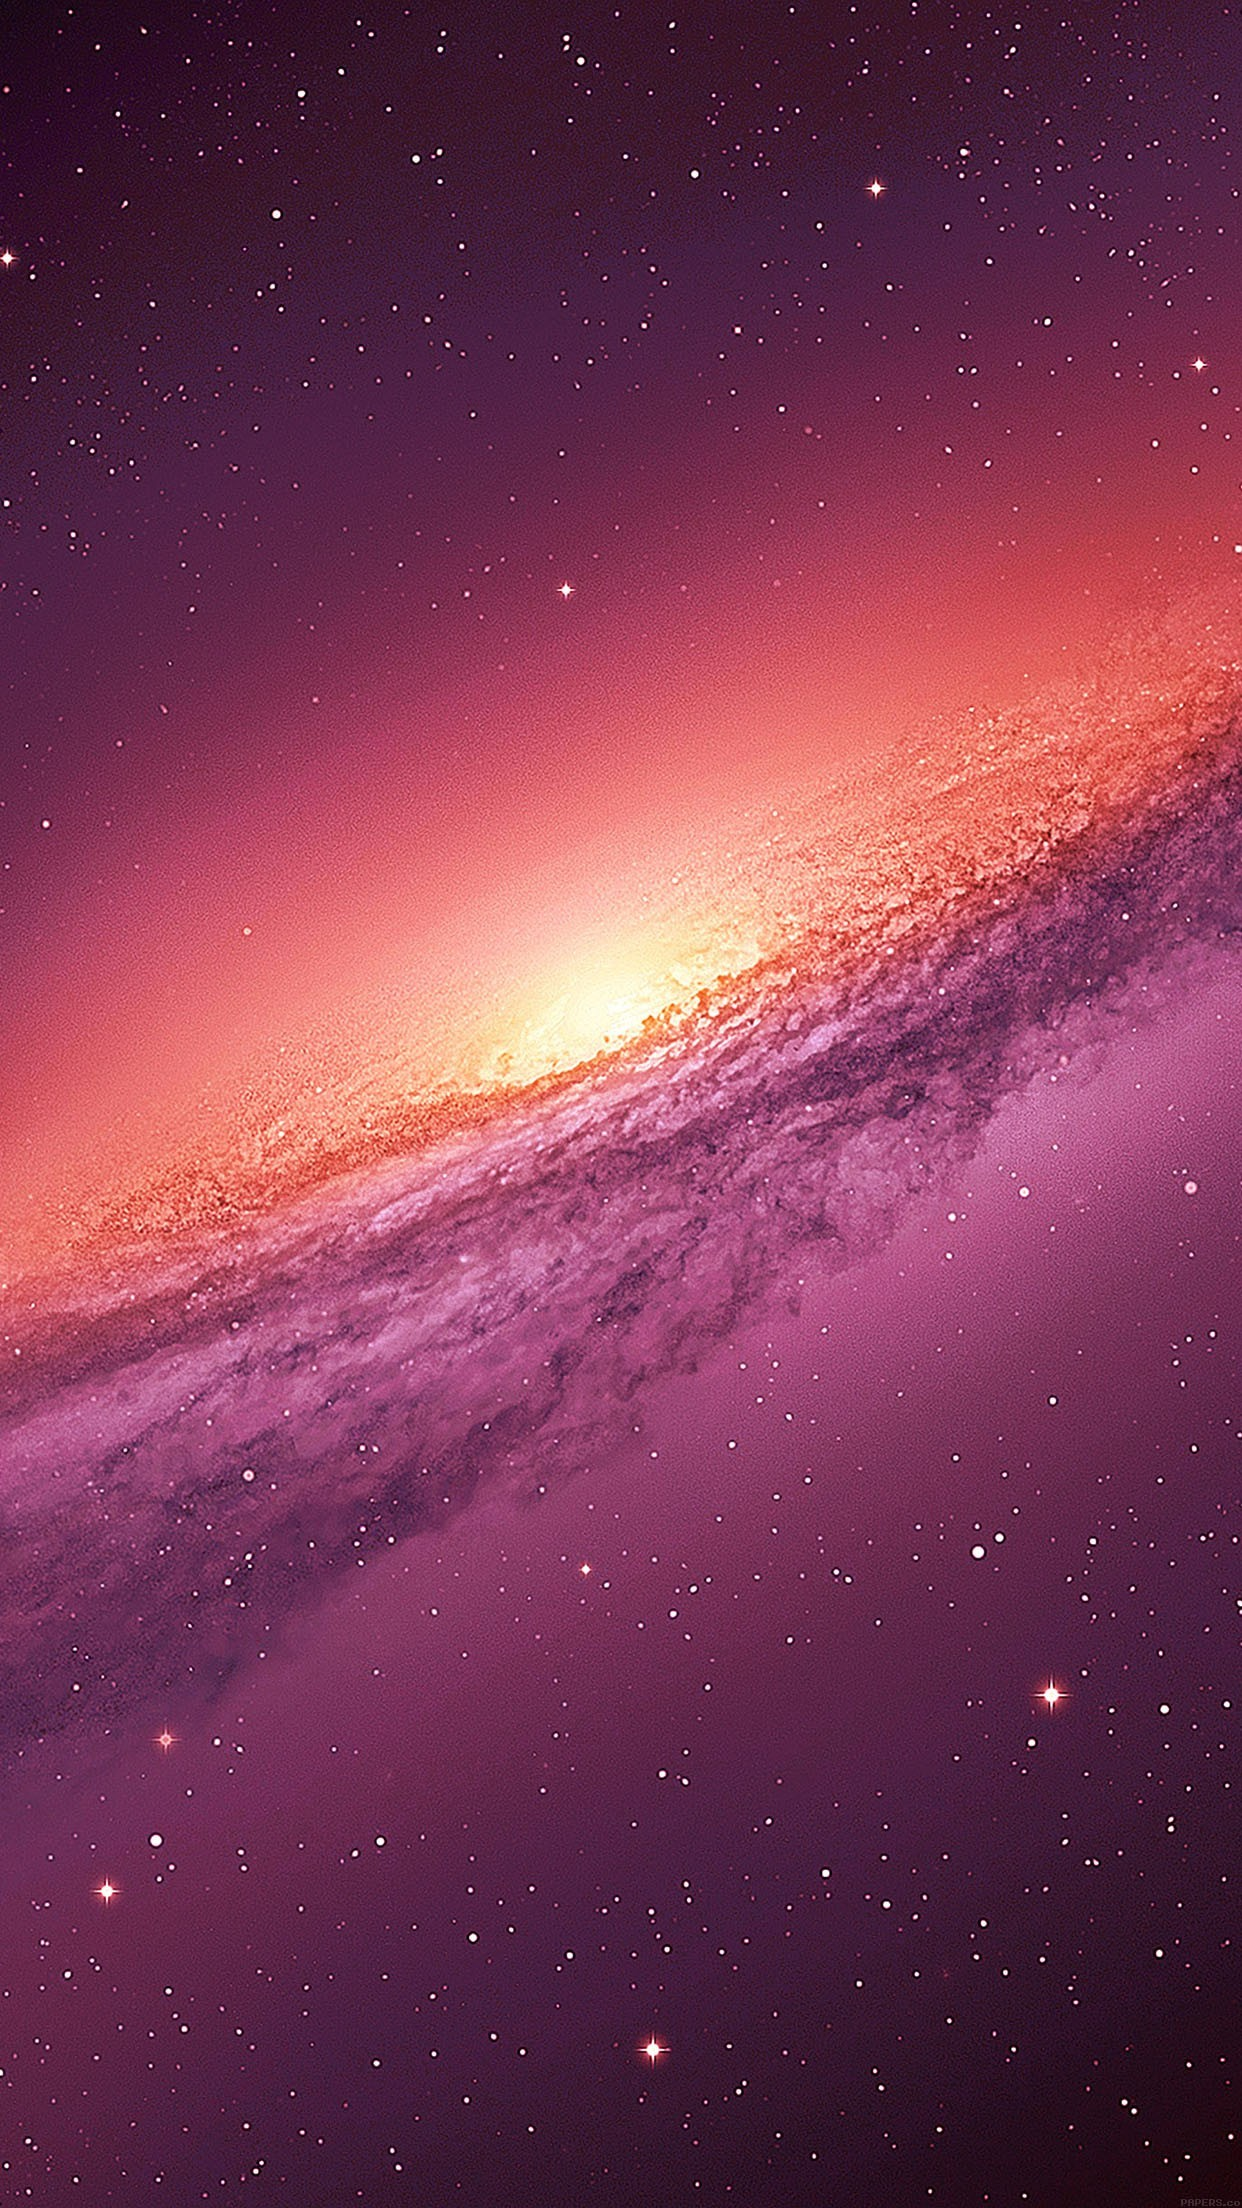 purple galaxy space nature iPhone 6 Plus Wallpapers – space odyssey iPhone 6  Plus Wallpapers